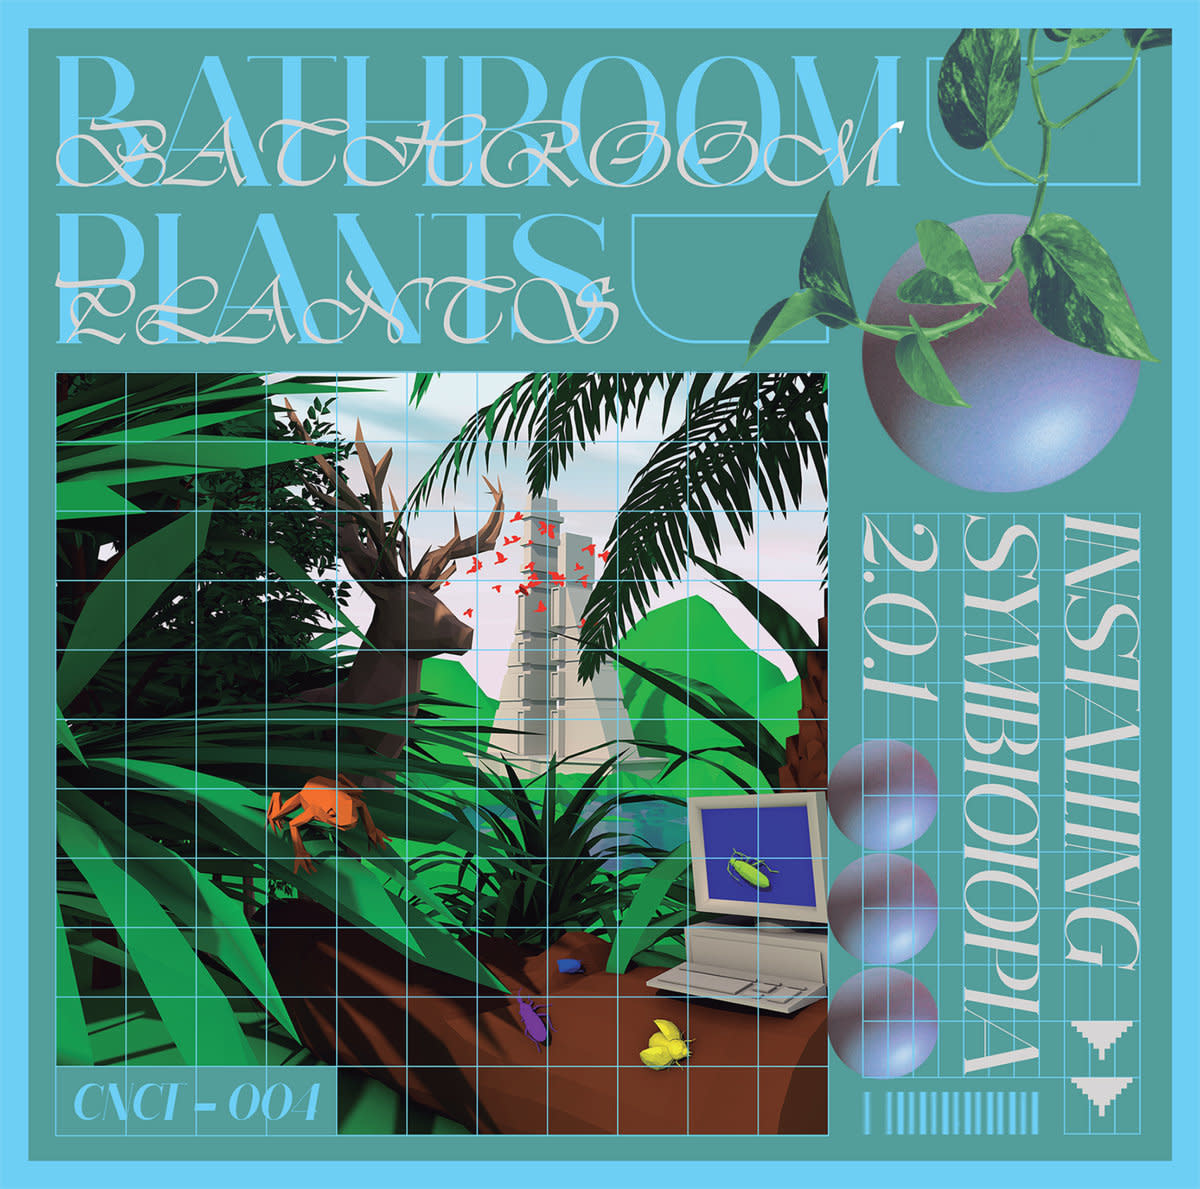 Bathroom Plants • Installing Symbiotopia 2.0.1-1